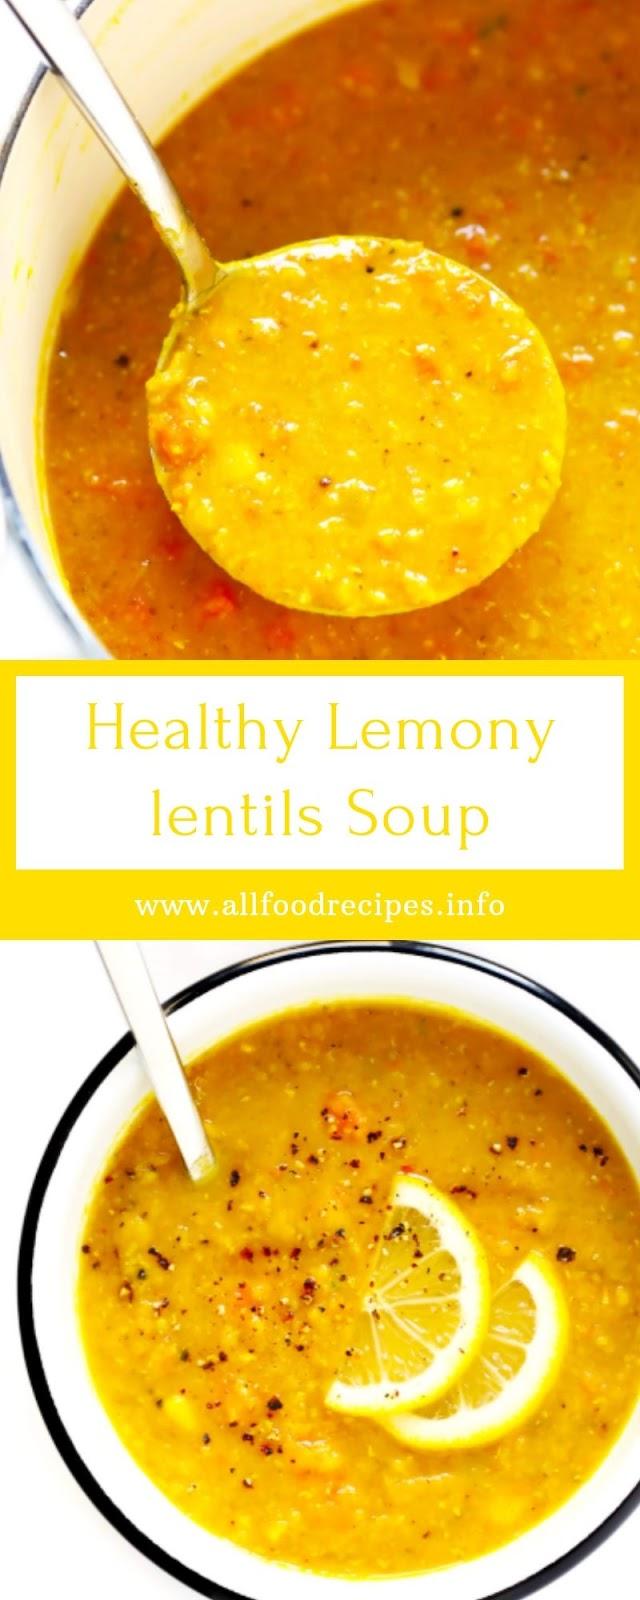 Healthy Lemony lentils Soup